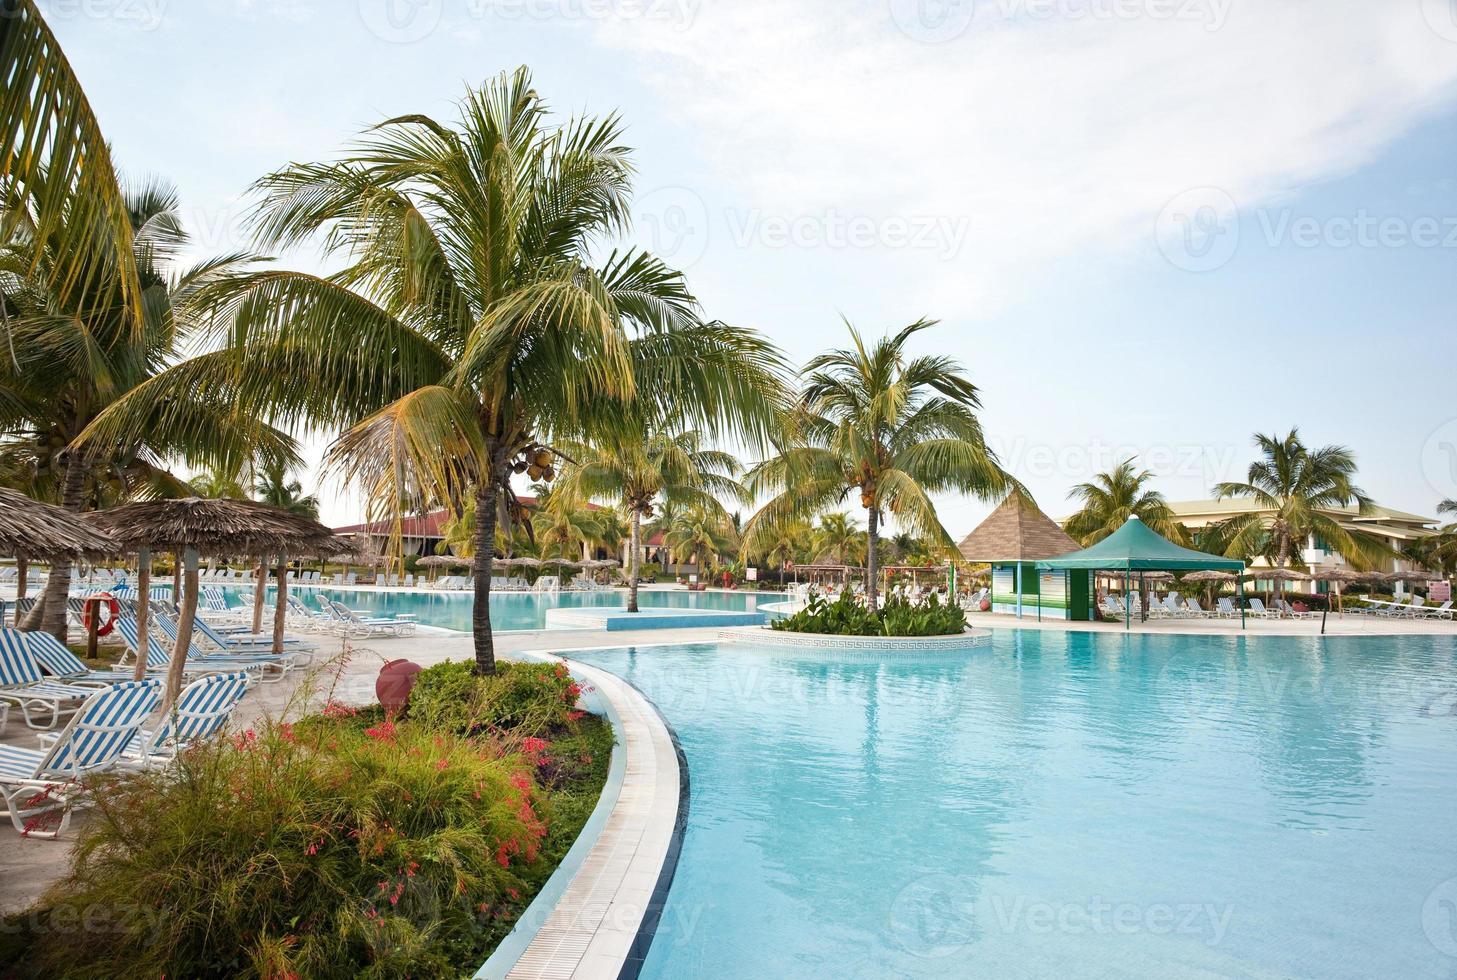 Caribbean Resort photo